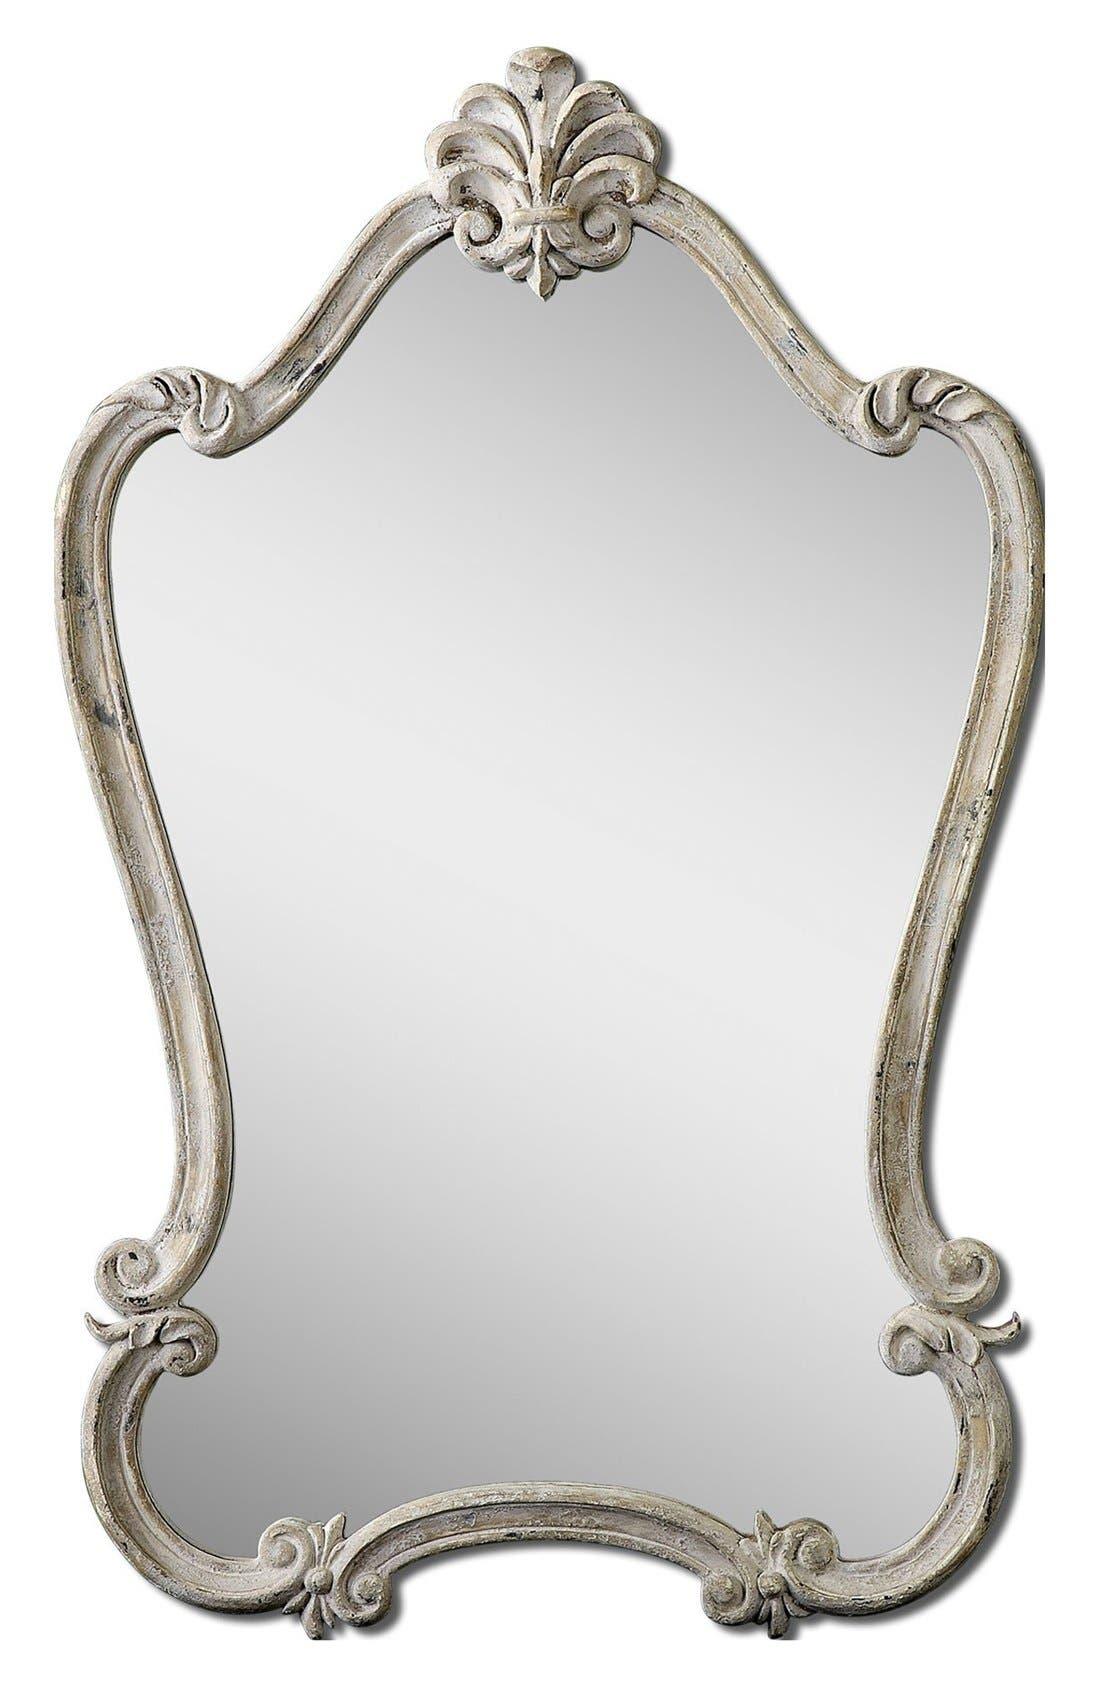 'Walton Hall' Antique White Vanity Mirror,                             Main thumbnail 1, color,                             100